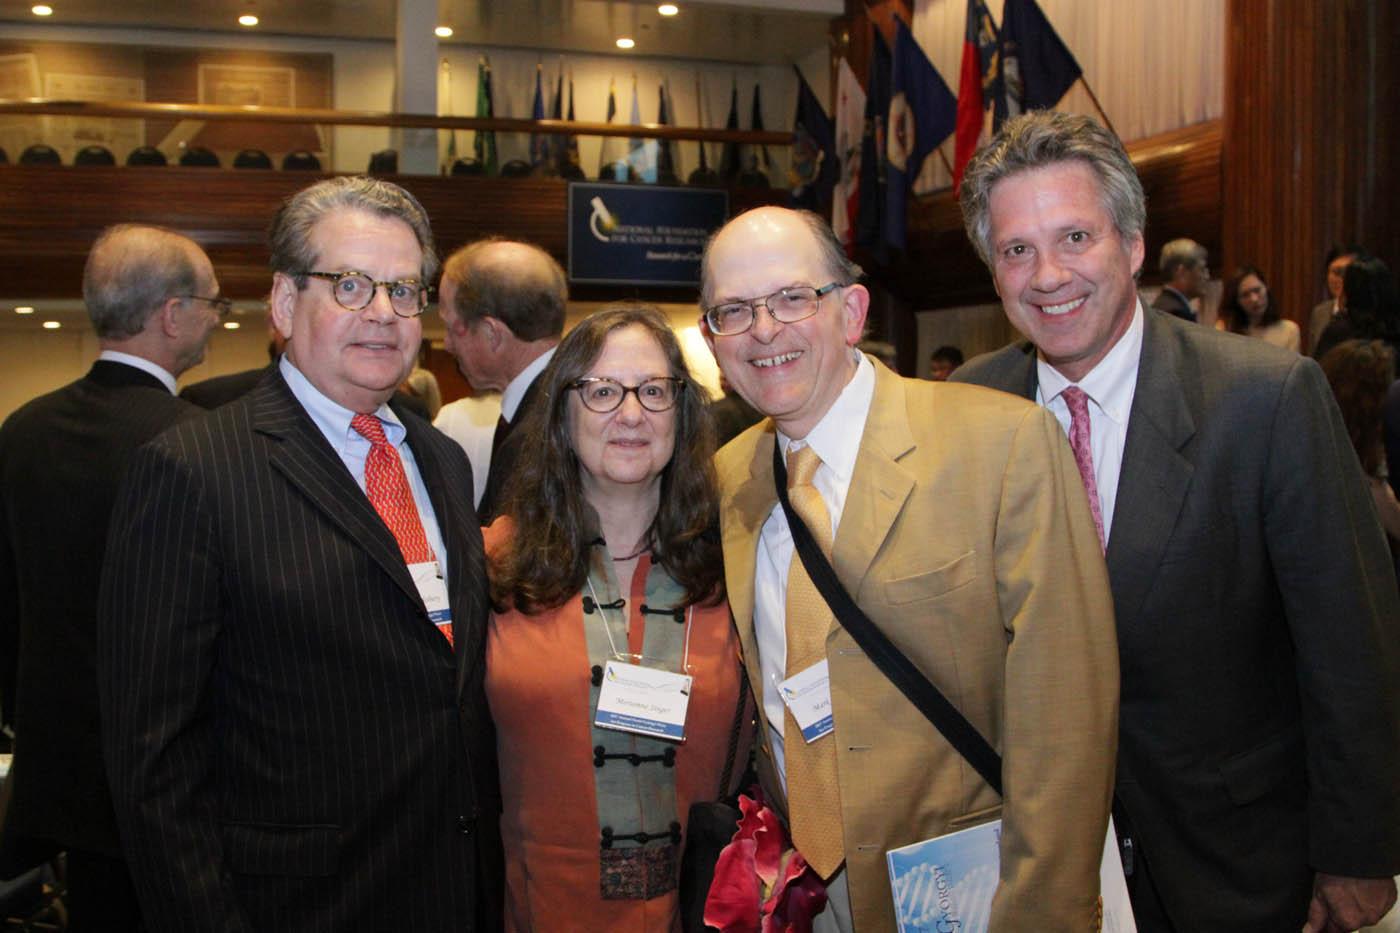 Franklin Salisbury & Dr. Bill Nelson with NFCR supporters Meriamne Singer and Mark Sorensen